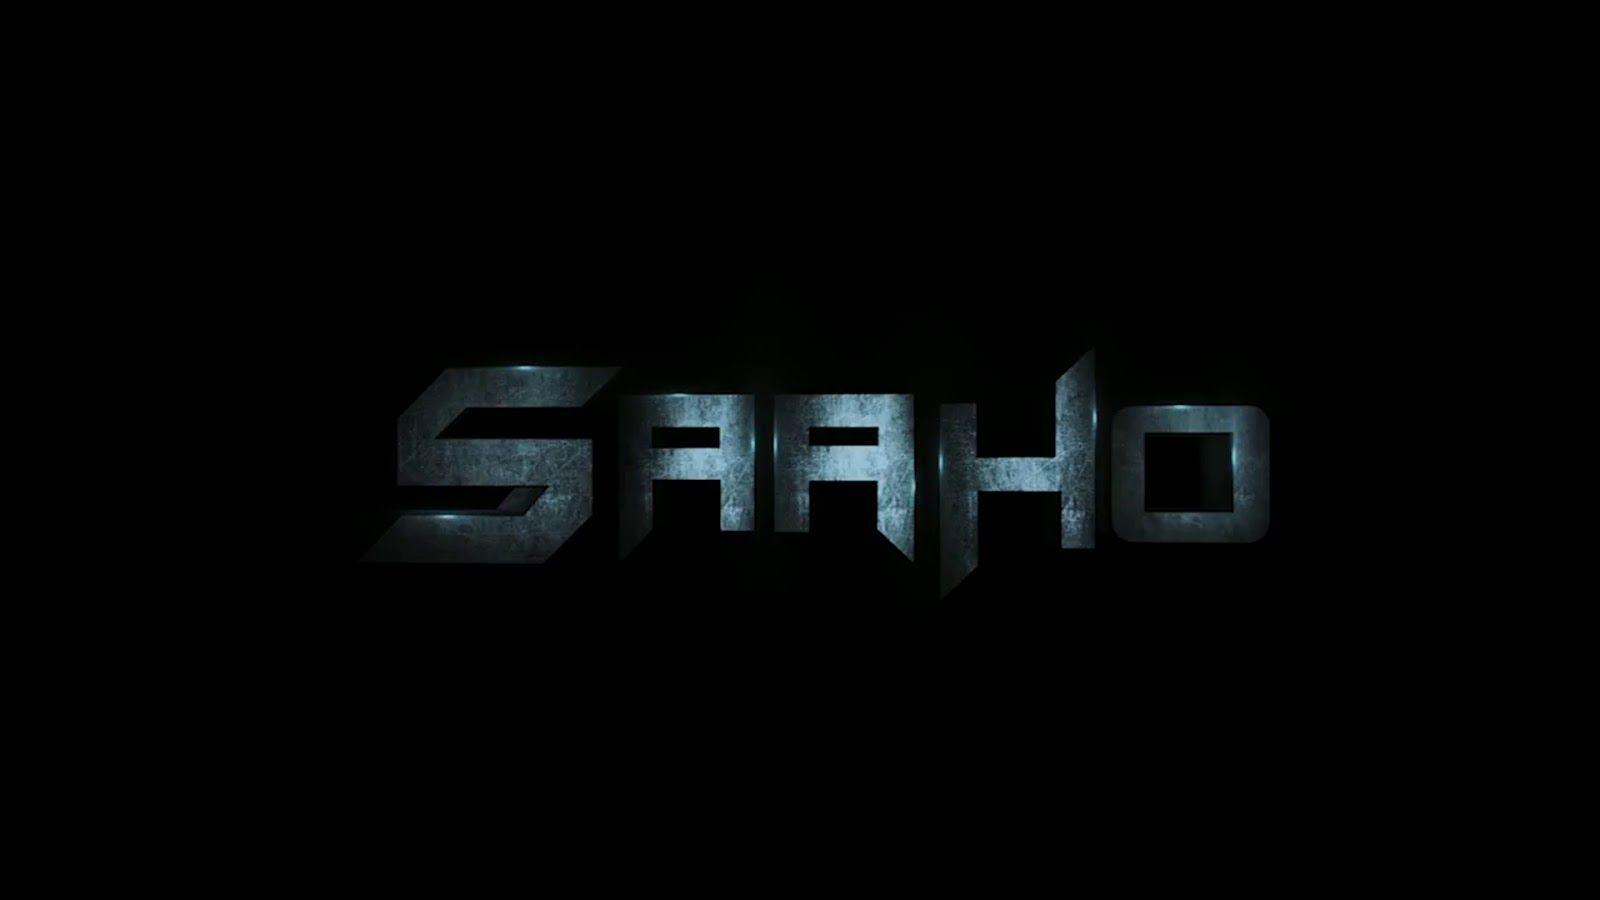 Saaho Is An Upcoming Telugu Movie Hd Wallpapers 1080p Hd